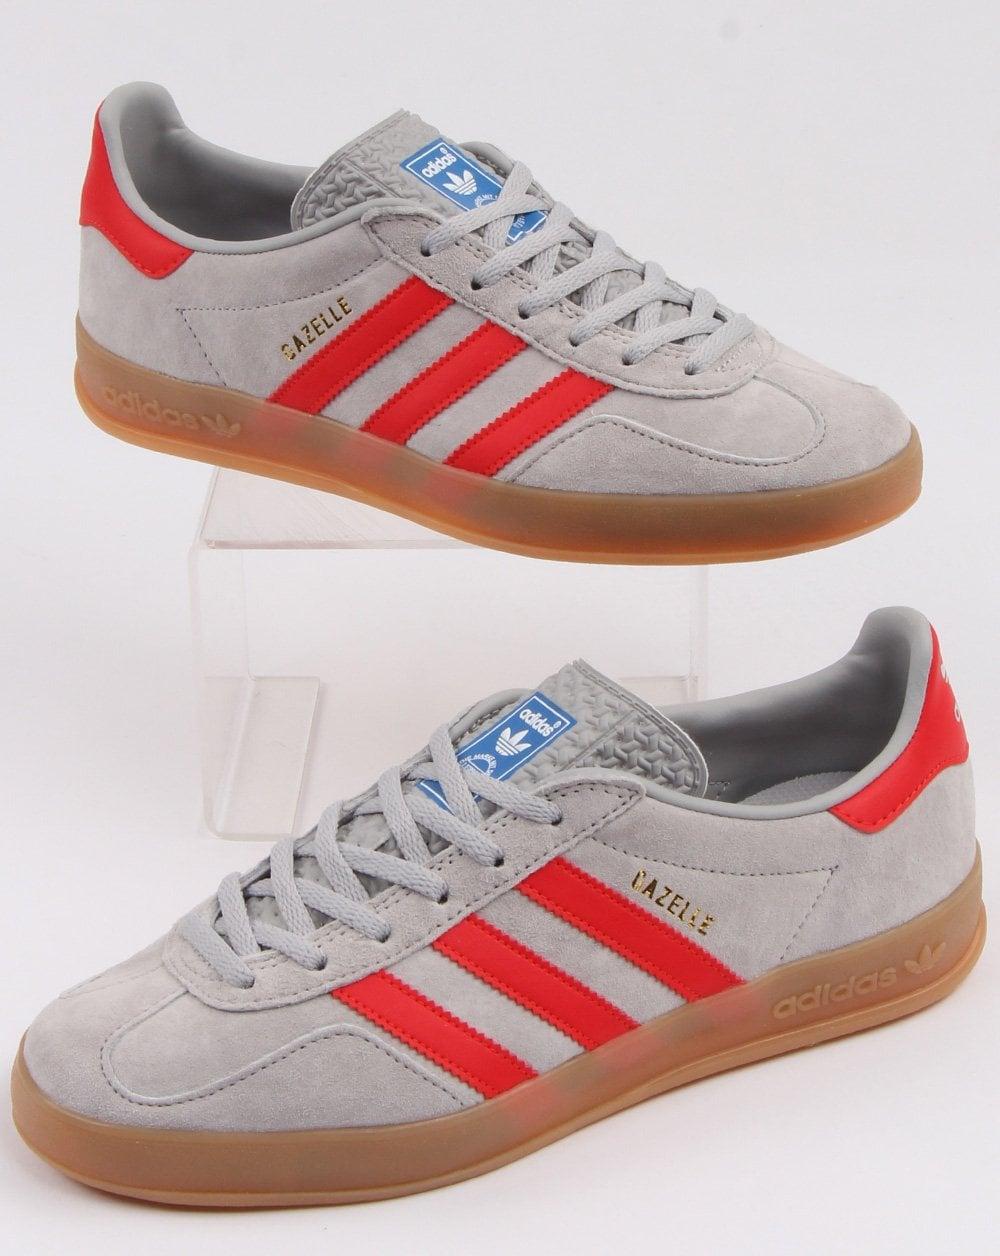 code promo 31215 abdb7 Adidas Gazelle Indoor Trainers Grey/red